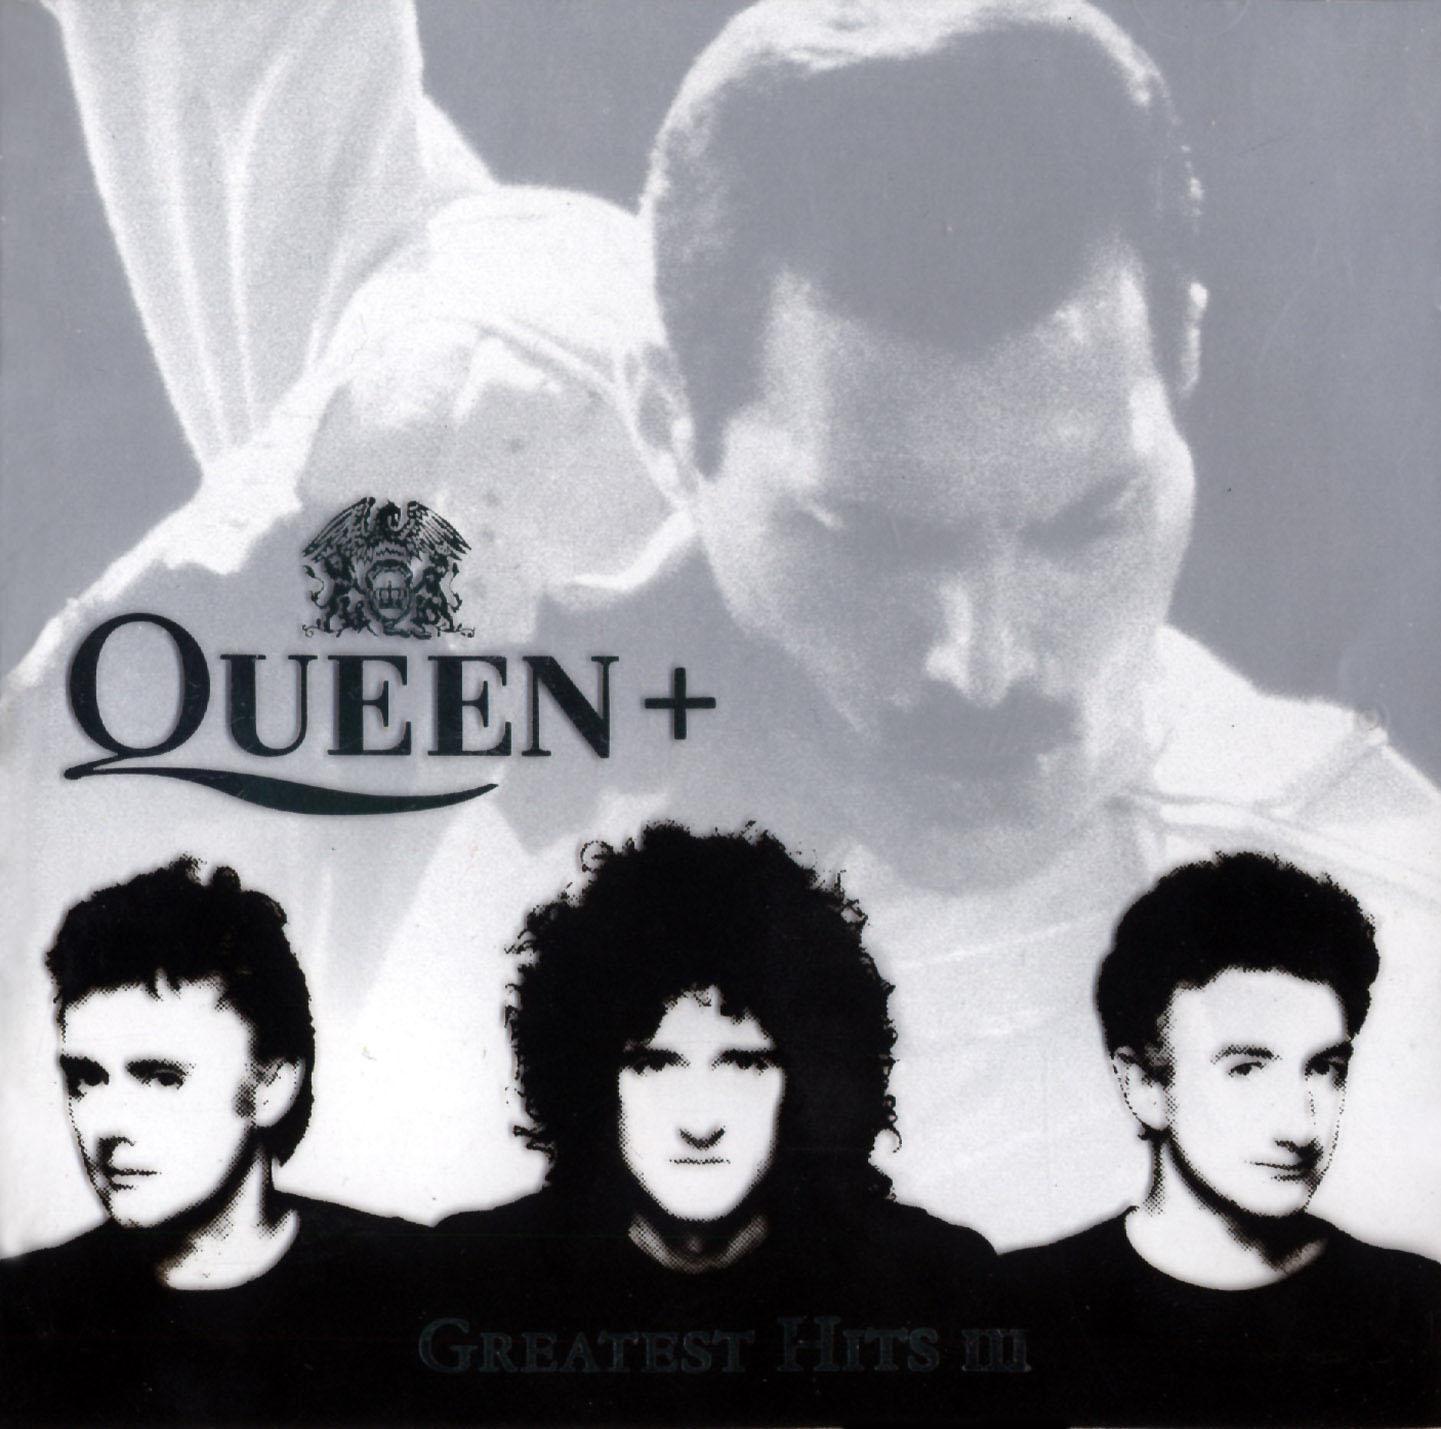 http://3.bp.blogspot.com/_mBxcJhiBfk0/TTSiIfXfixI/AAAAAAAAHHg/Cv1-1_FWO4g/s1600/Queen-Greatest_Hits_III-Frontal.jpg